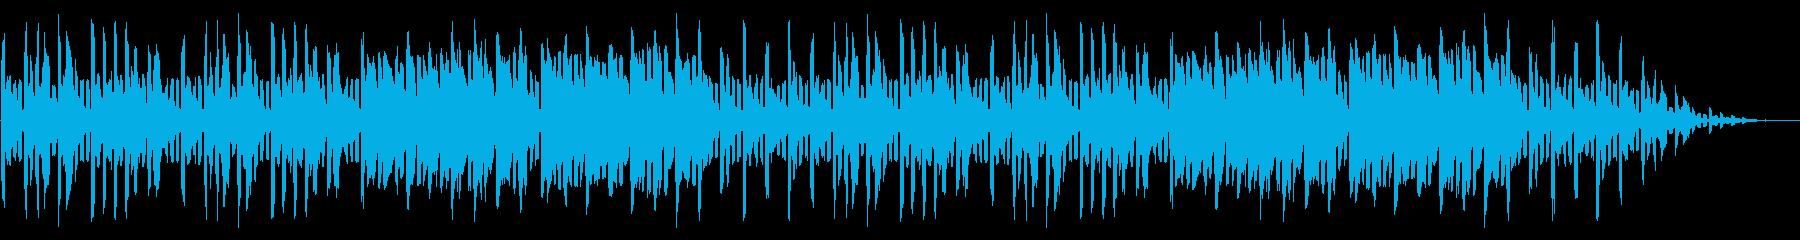 GB風シューティングのエンディング曲の再生済みの波形